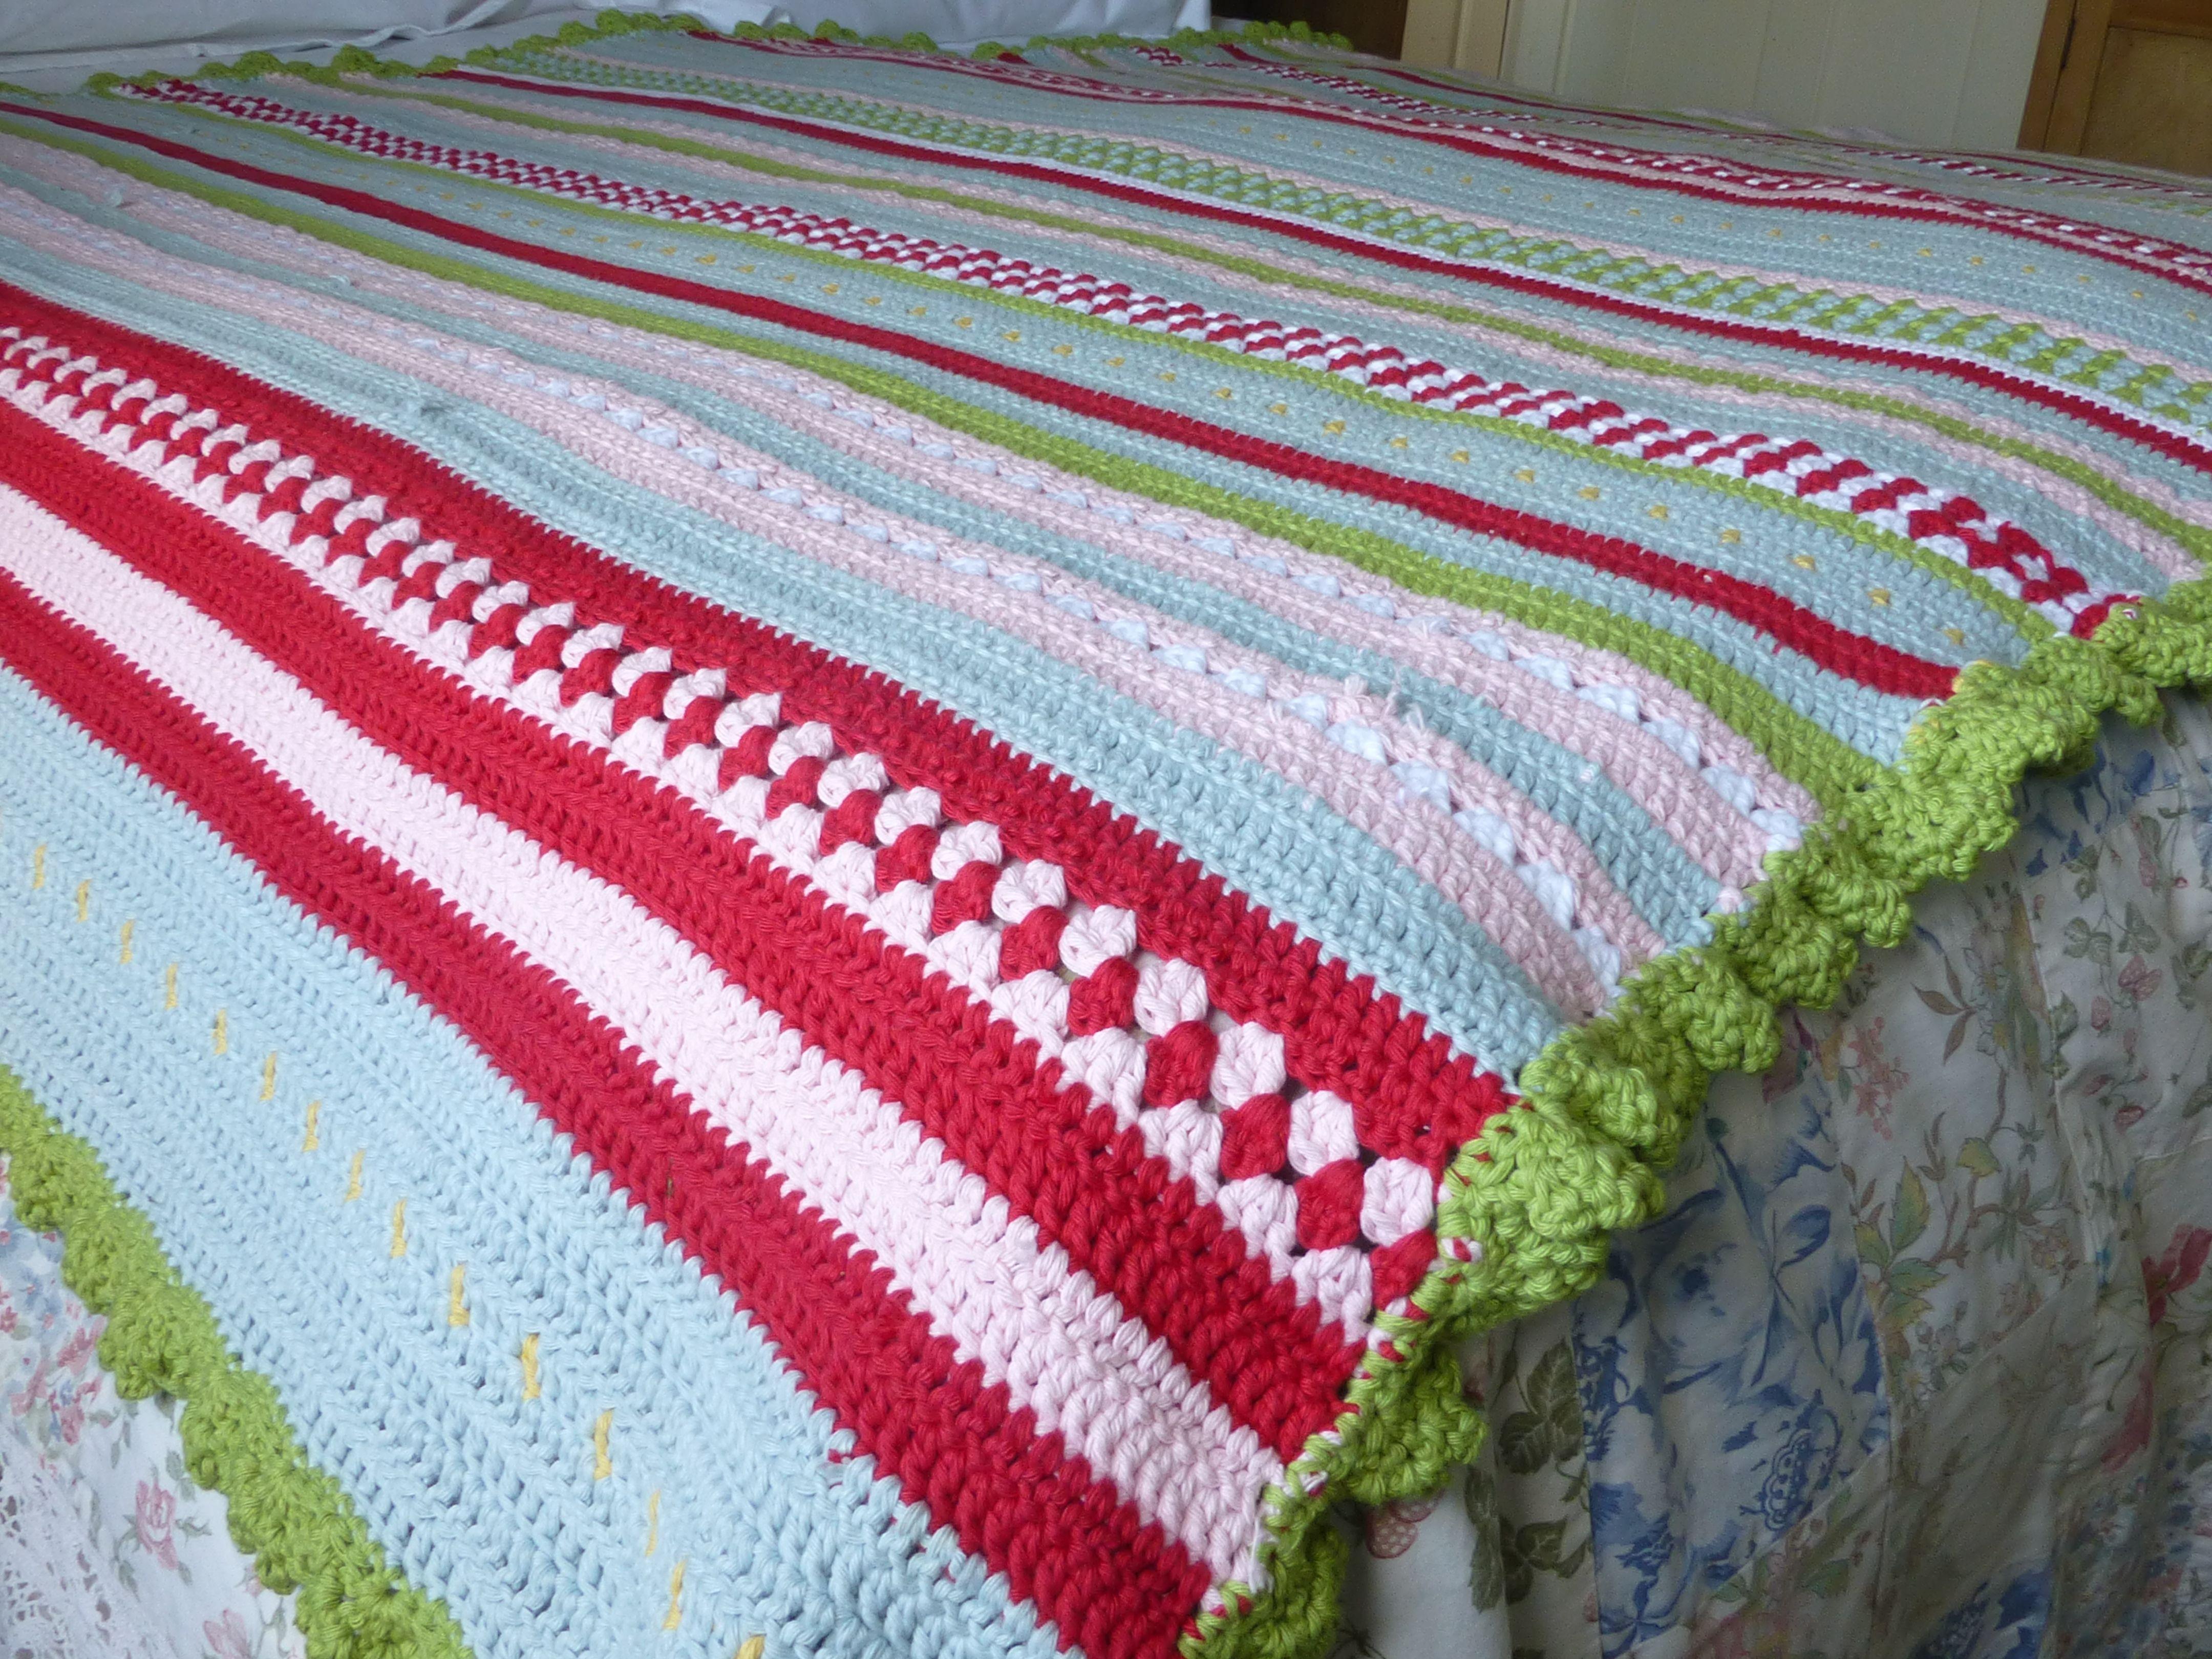 Greengate Style Crochet Blanket4 Greengate Style Crochet Blanket